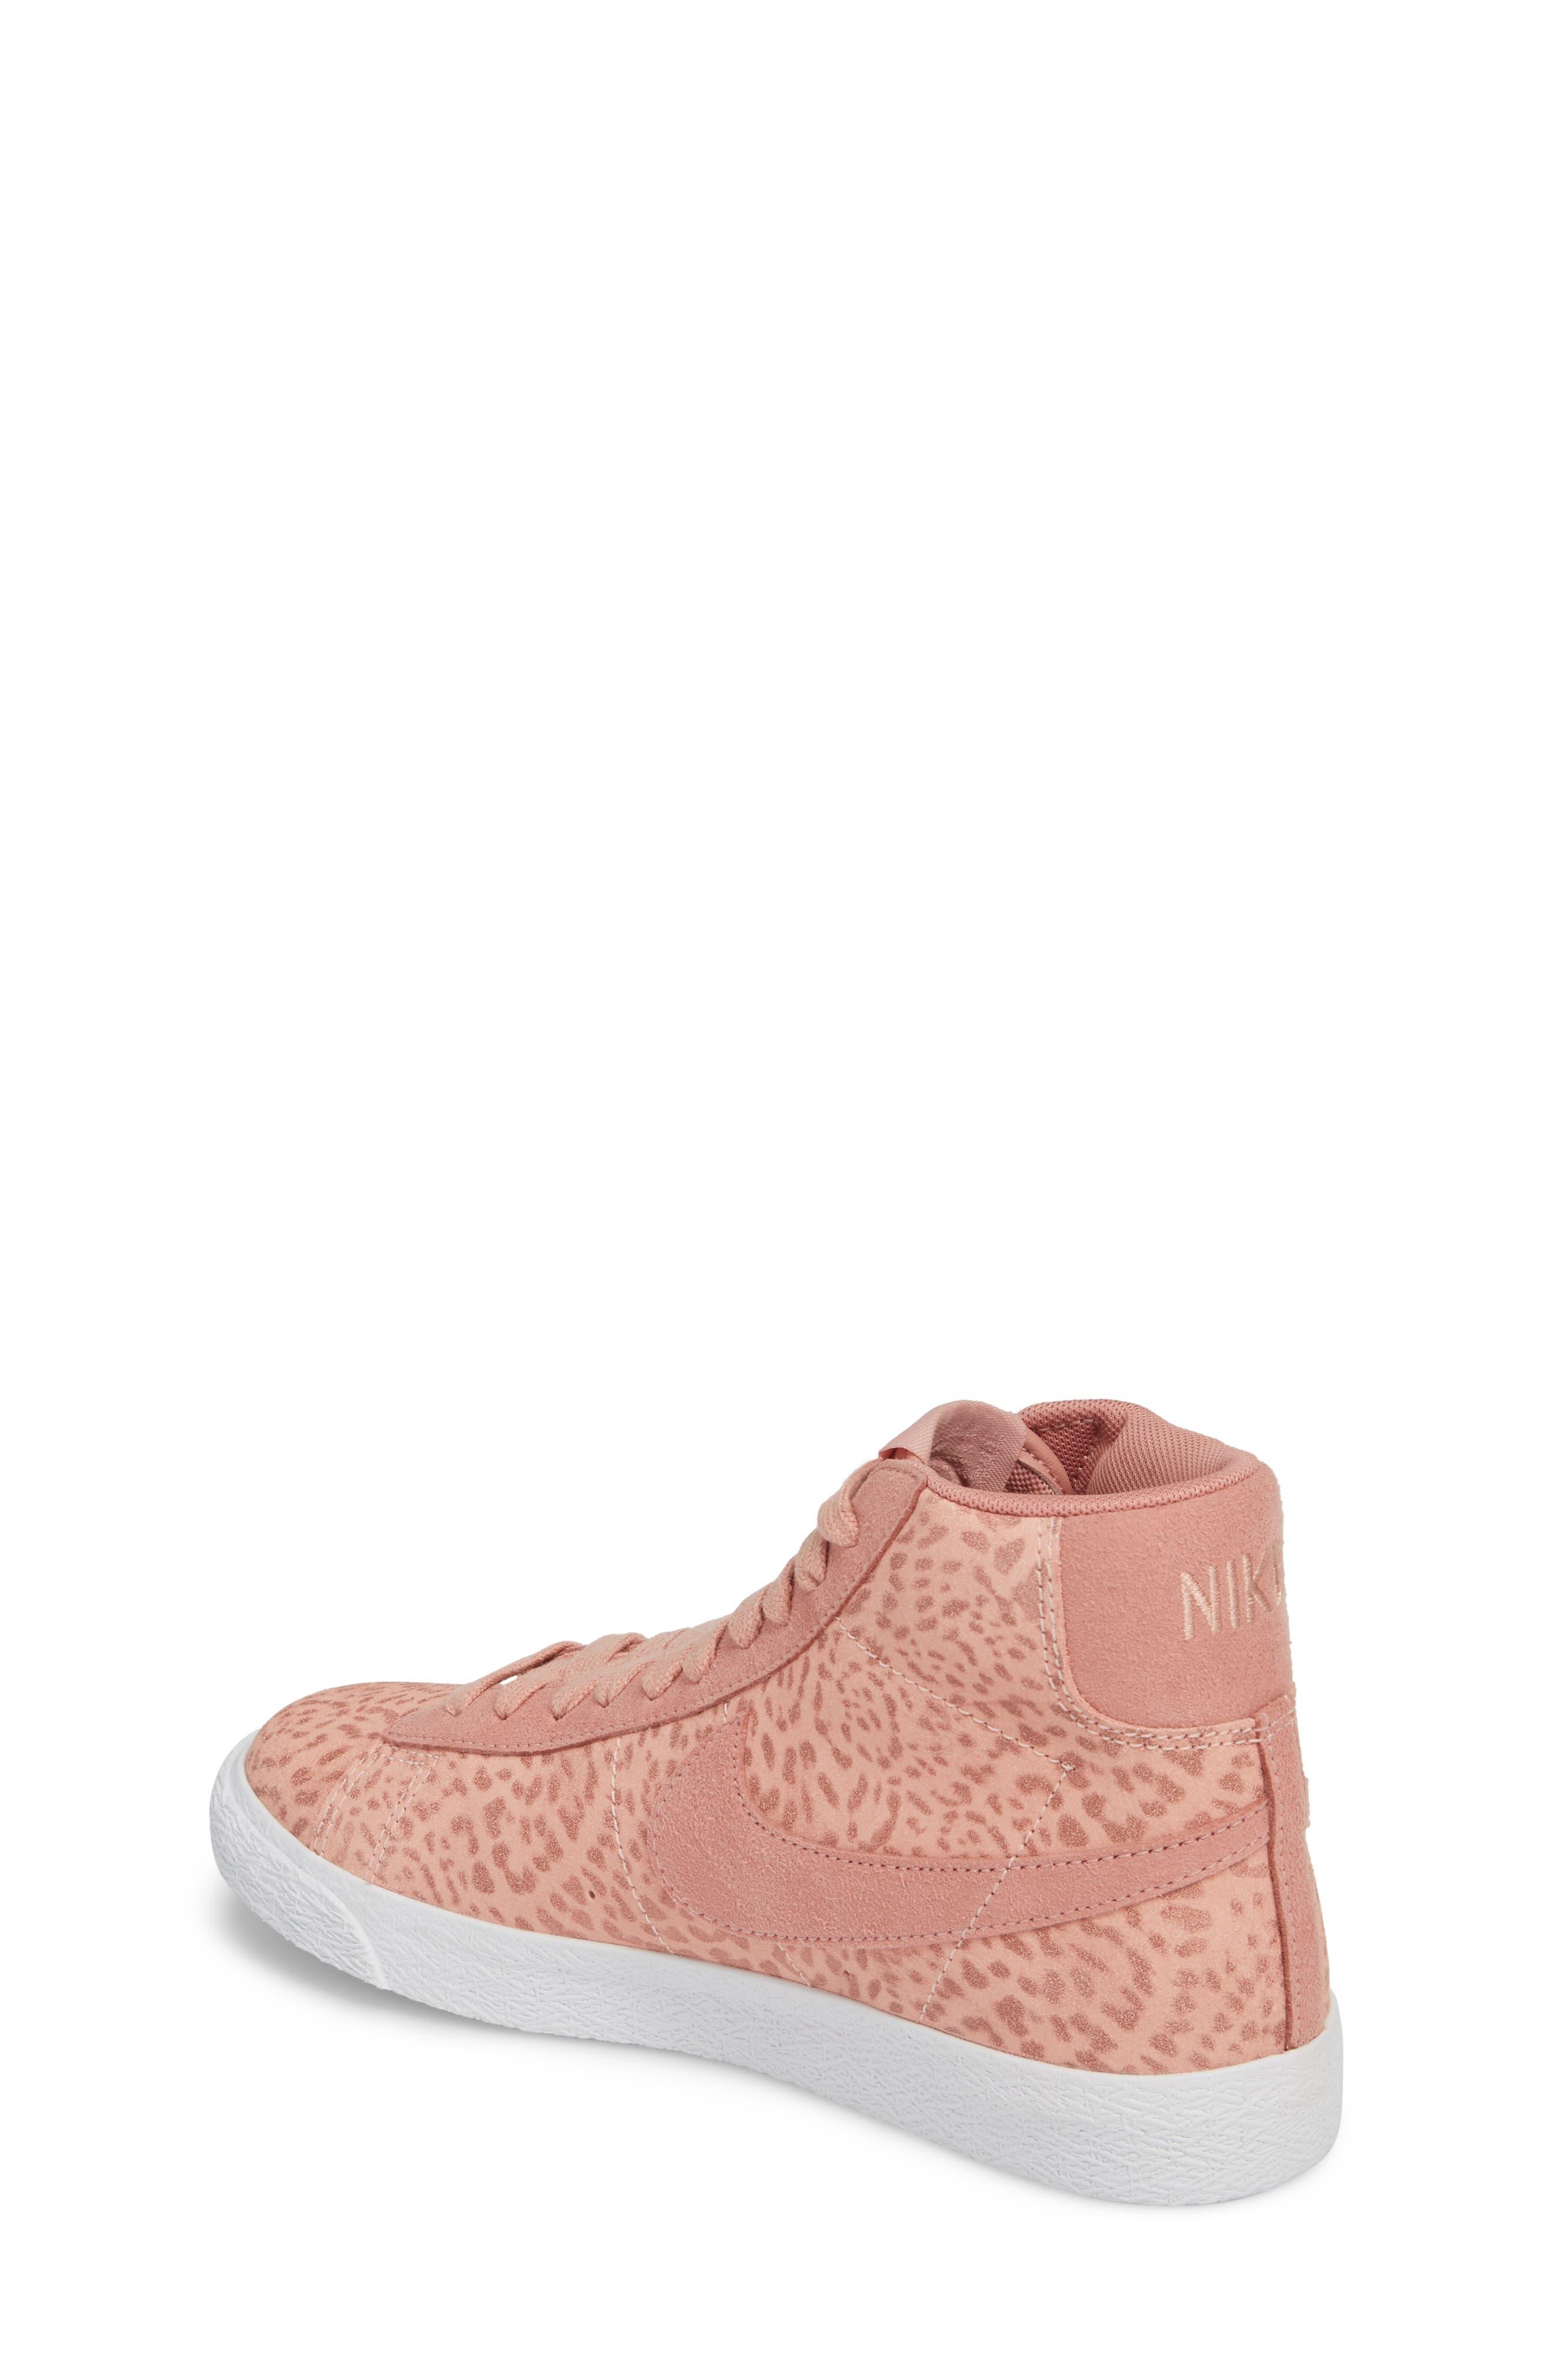 Blazer Mid SE High Top Sneaker,                             Alternate thumbnail 5, color,